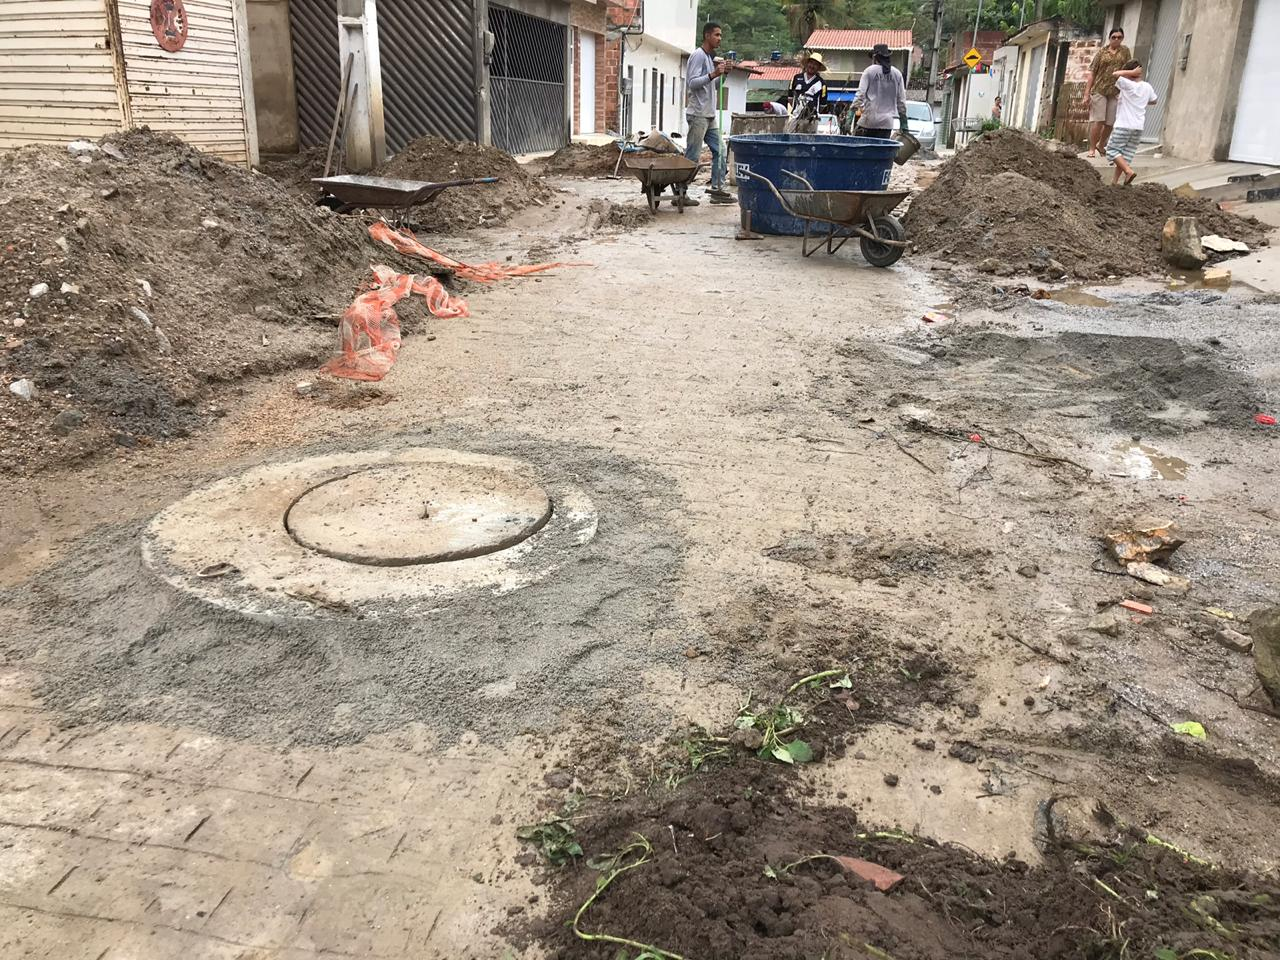 https://caruaru.pe.gov.br/wp-content/uploads/2020/01/foto-1.jpeg